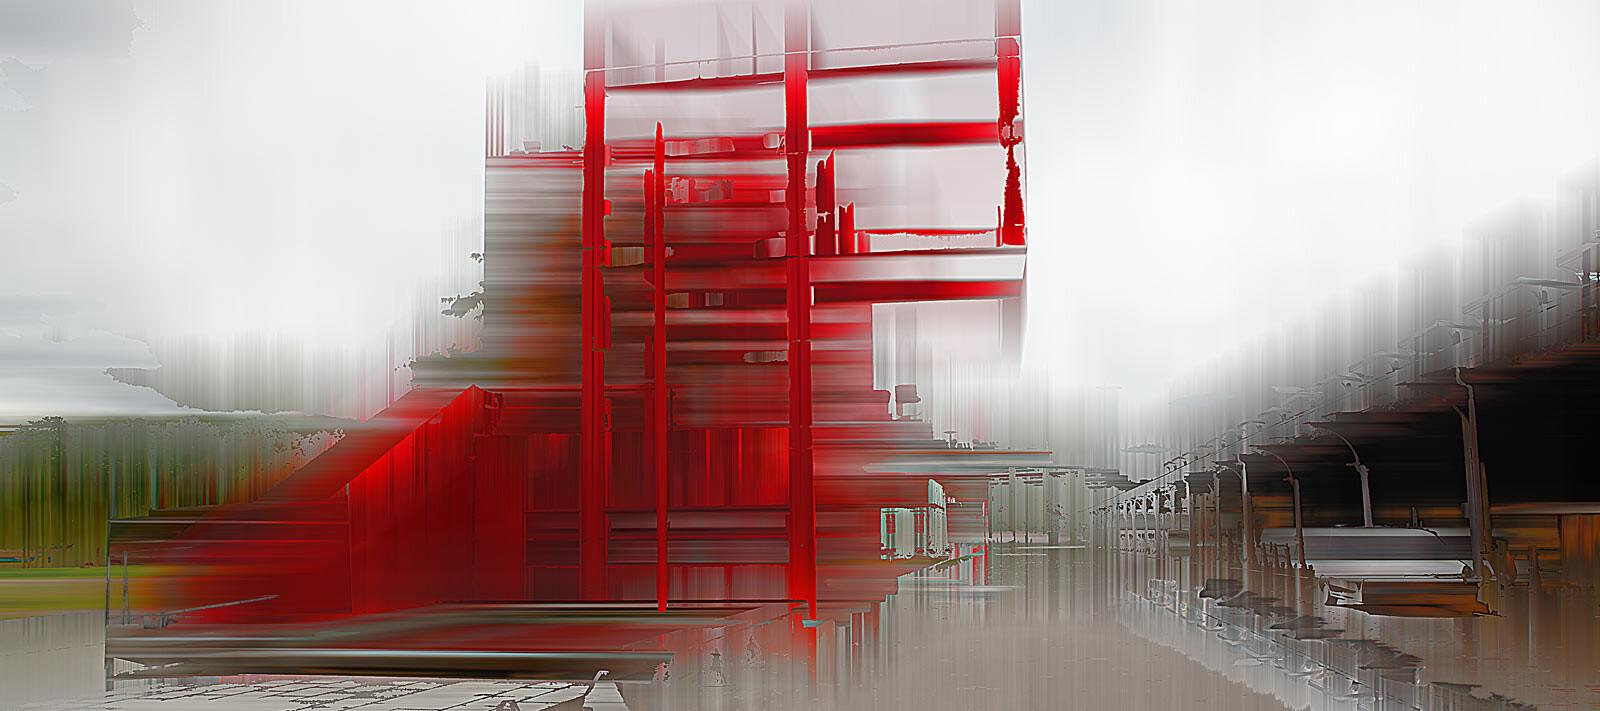 Paris Projections I - Sabine Wild